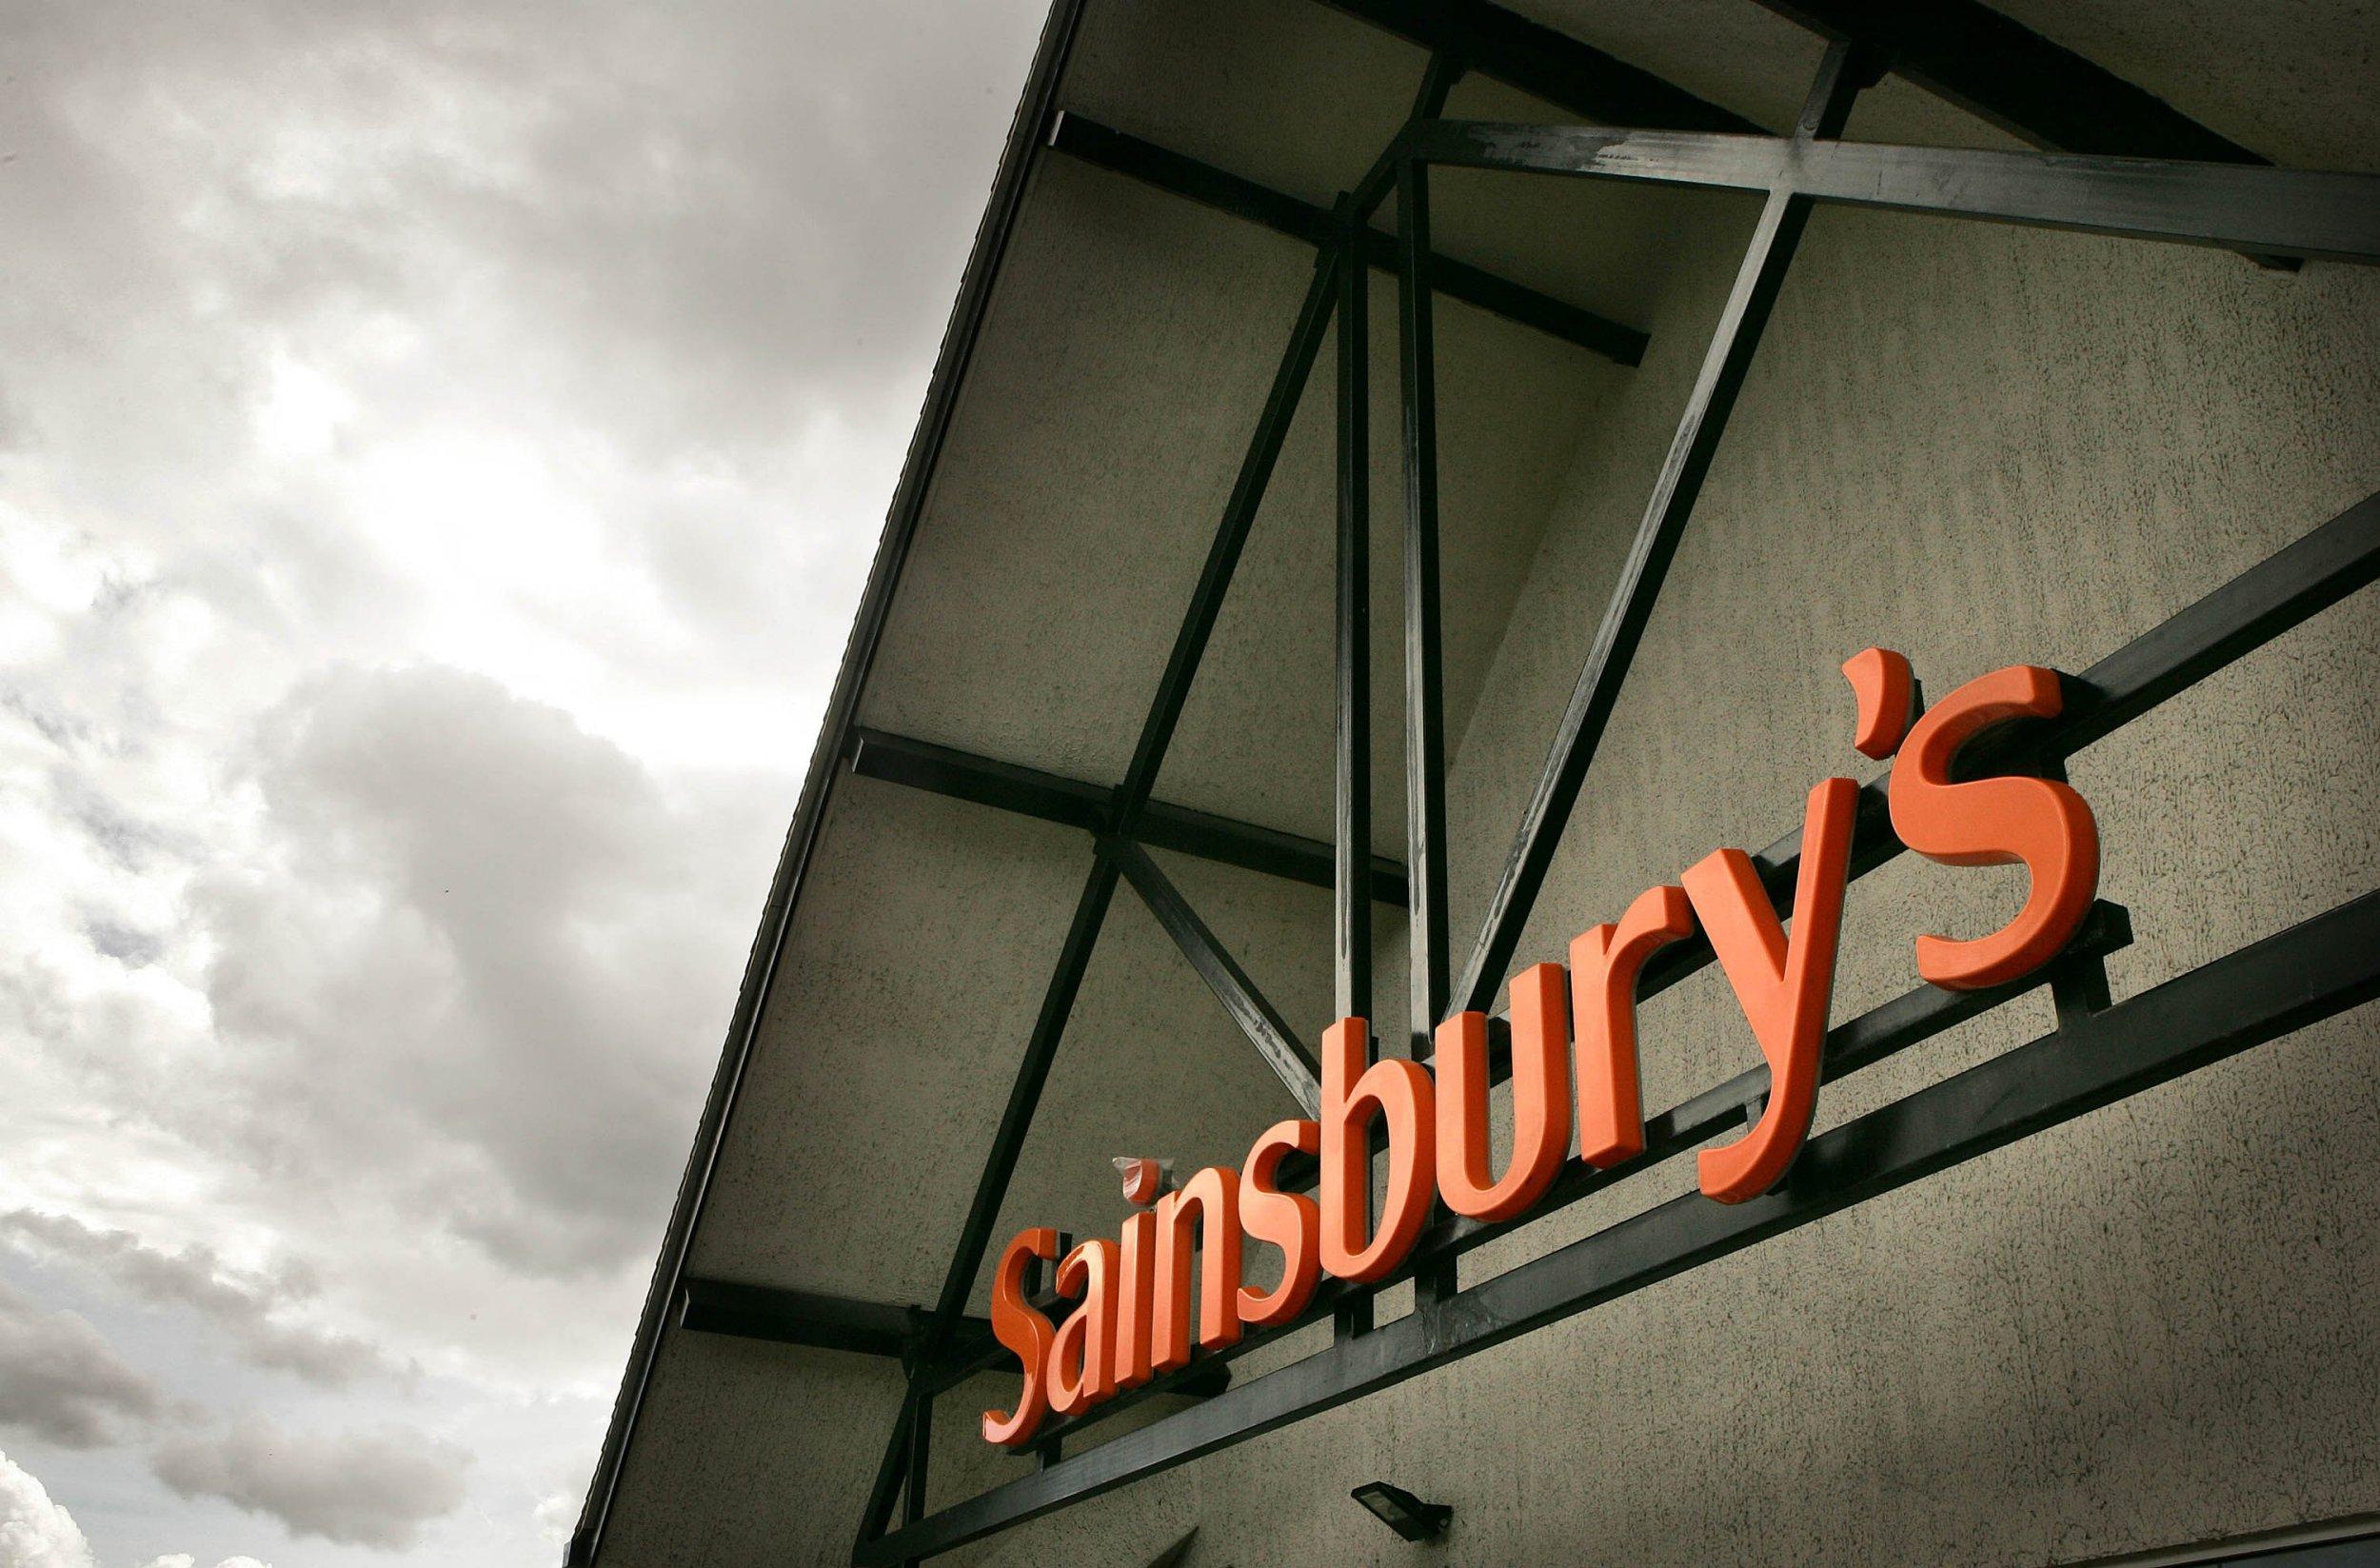 the orange logo on a sainsbury's shop front